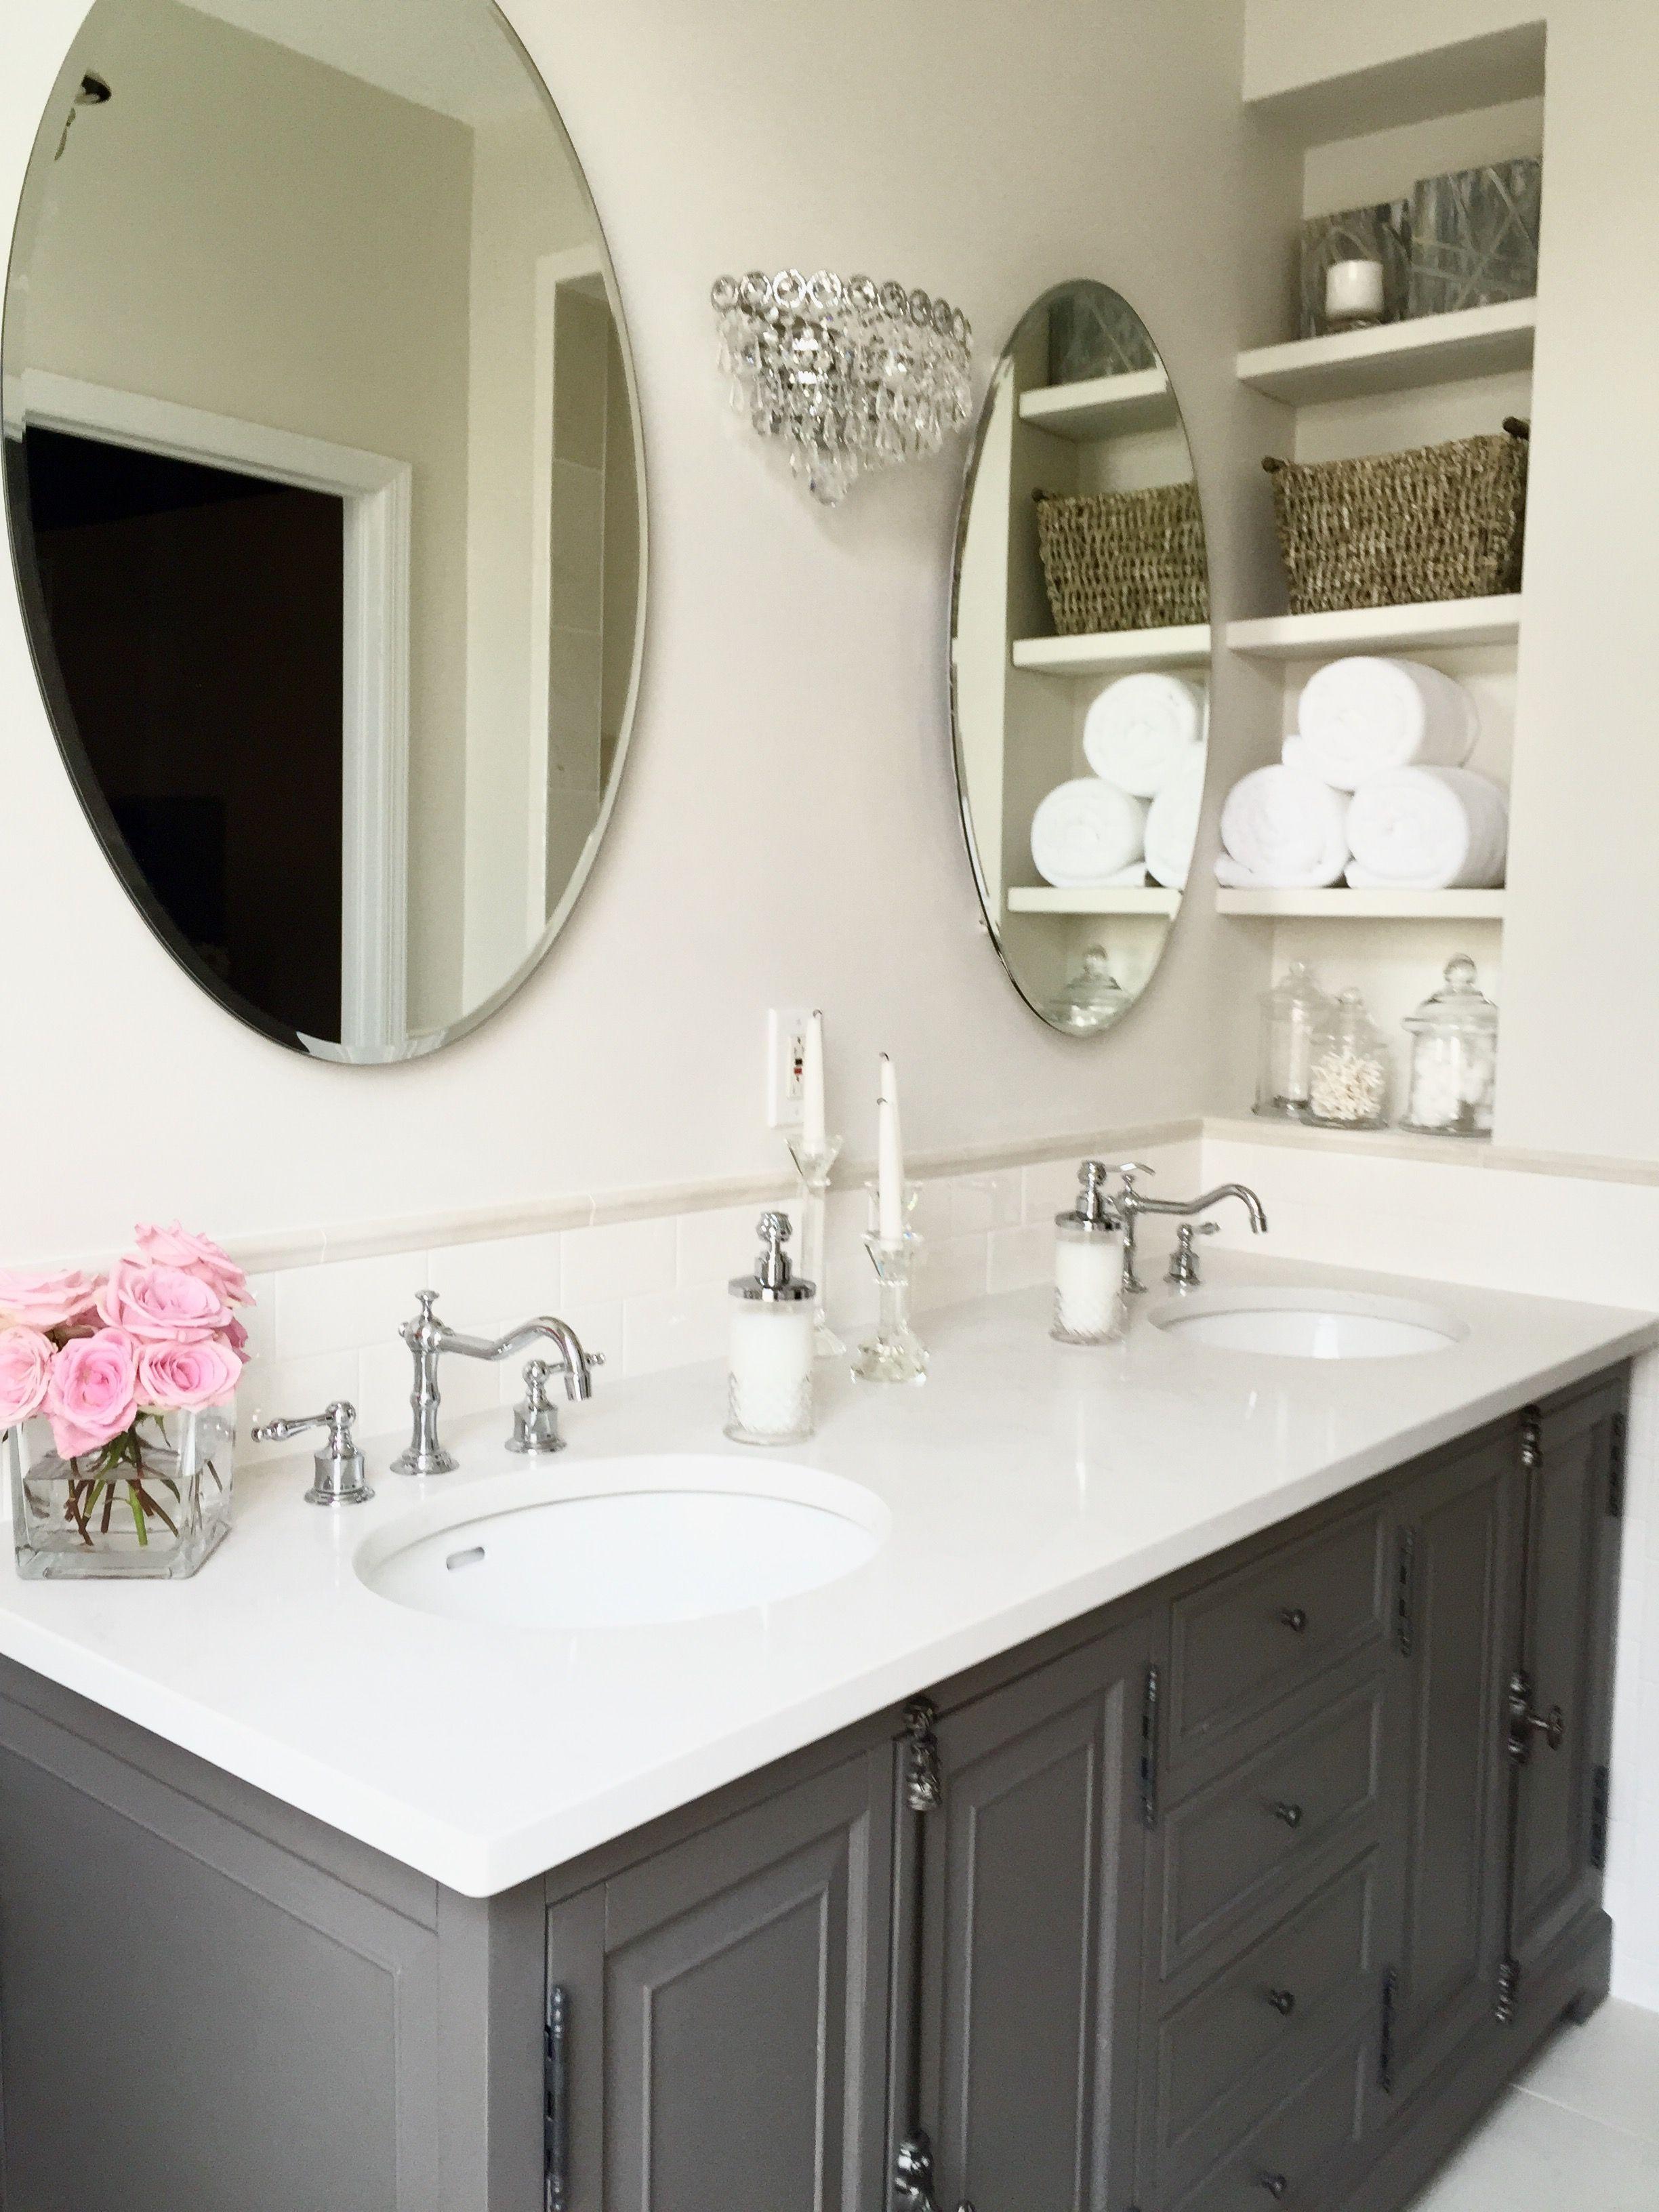 Carreralook Porcelain Tile And Quartz That Looks Like Marble; Crossville  Virtue And Pentalquartz